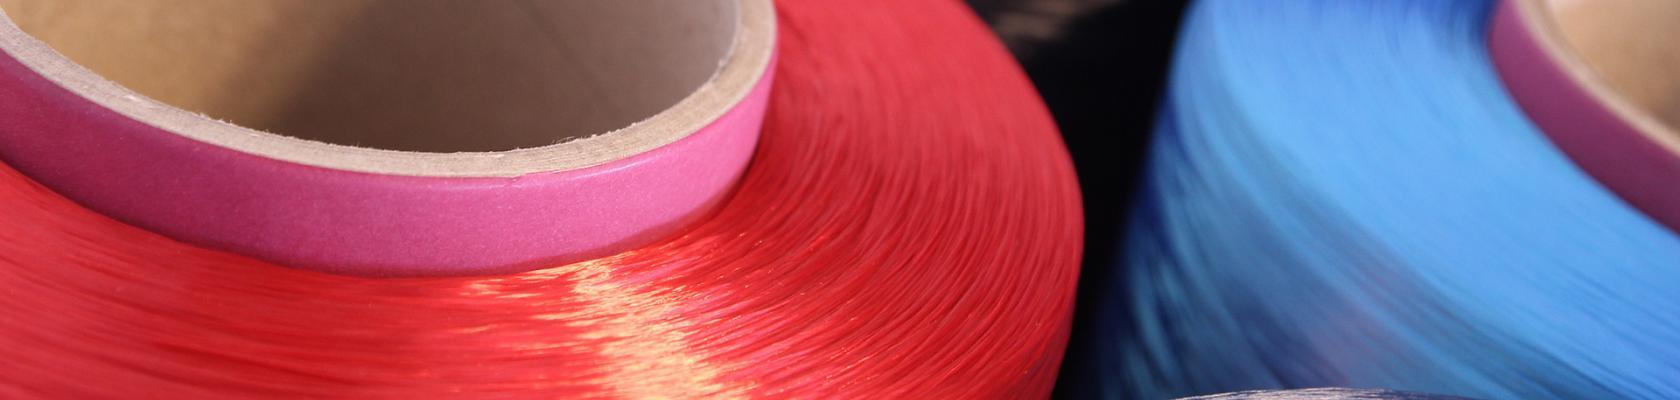 rpet colored industrial yarns